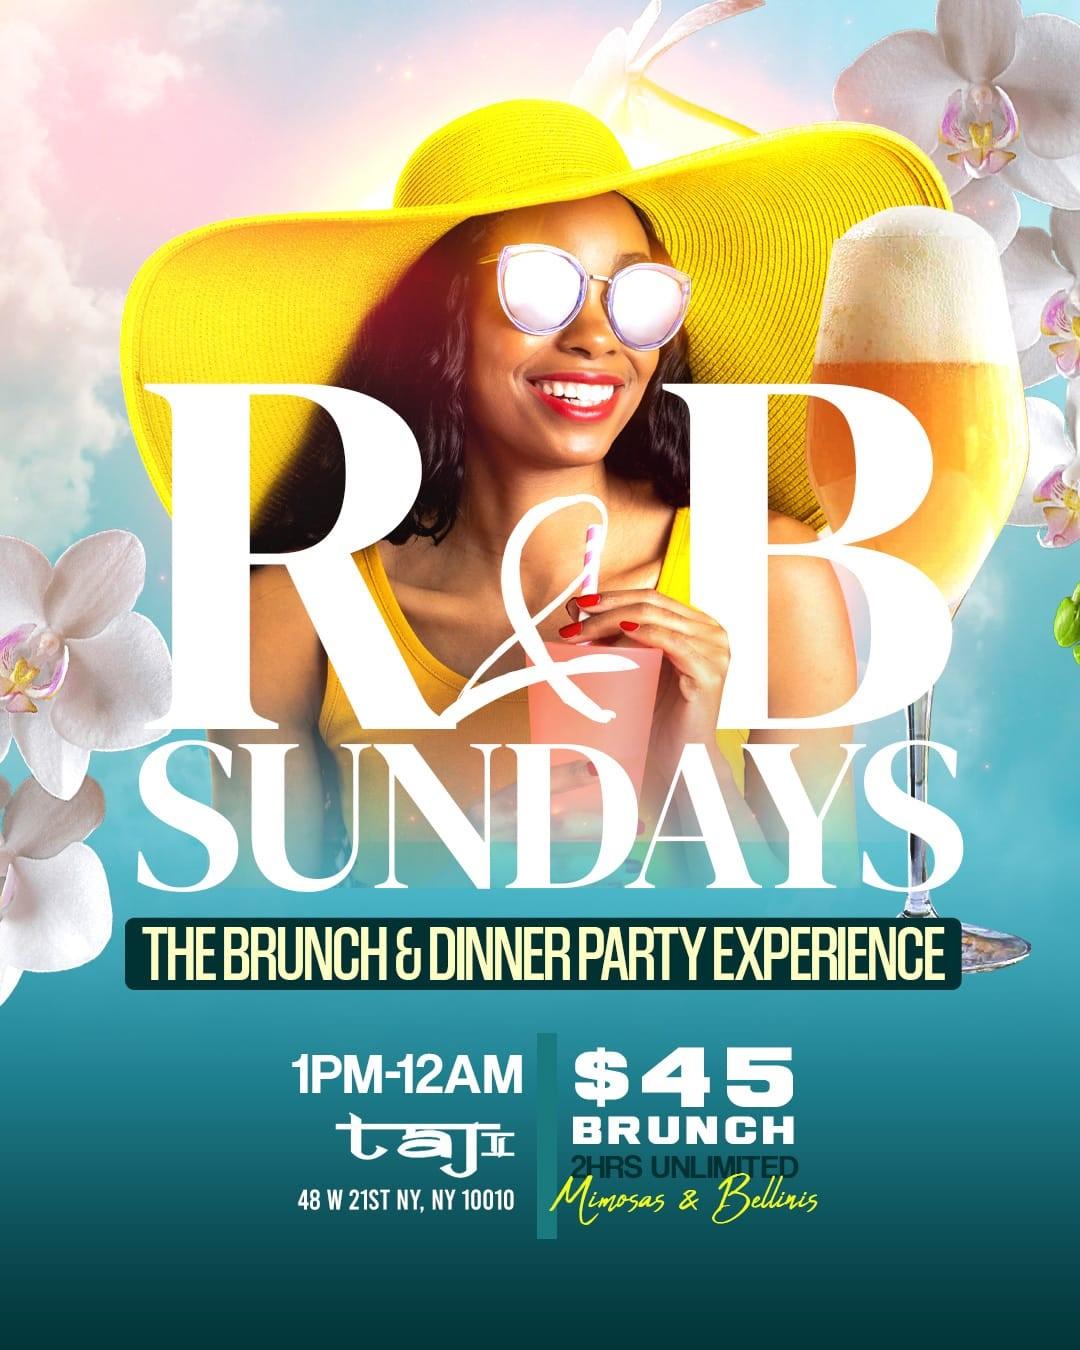 Taj Lounge Brunch on Sunday 2021  on Jul 25, 13:00@Taj Lounge - Buy tickets and Get information on GametightNY